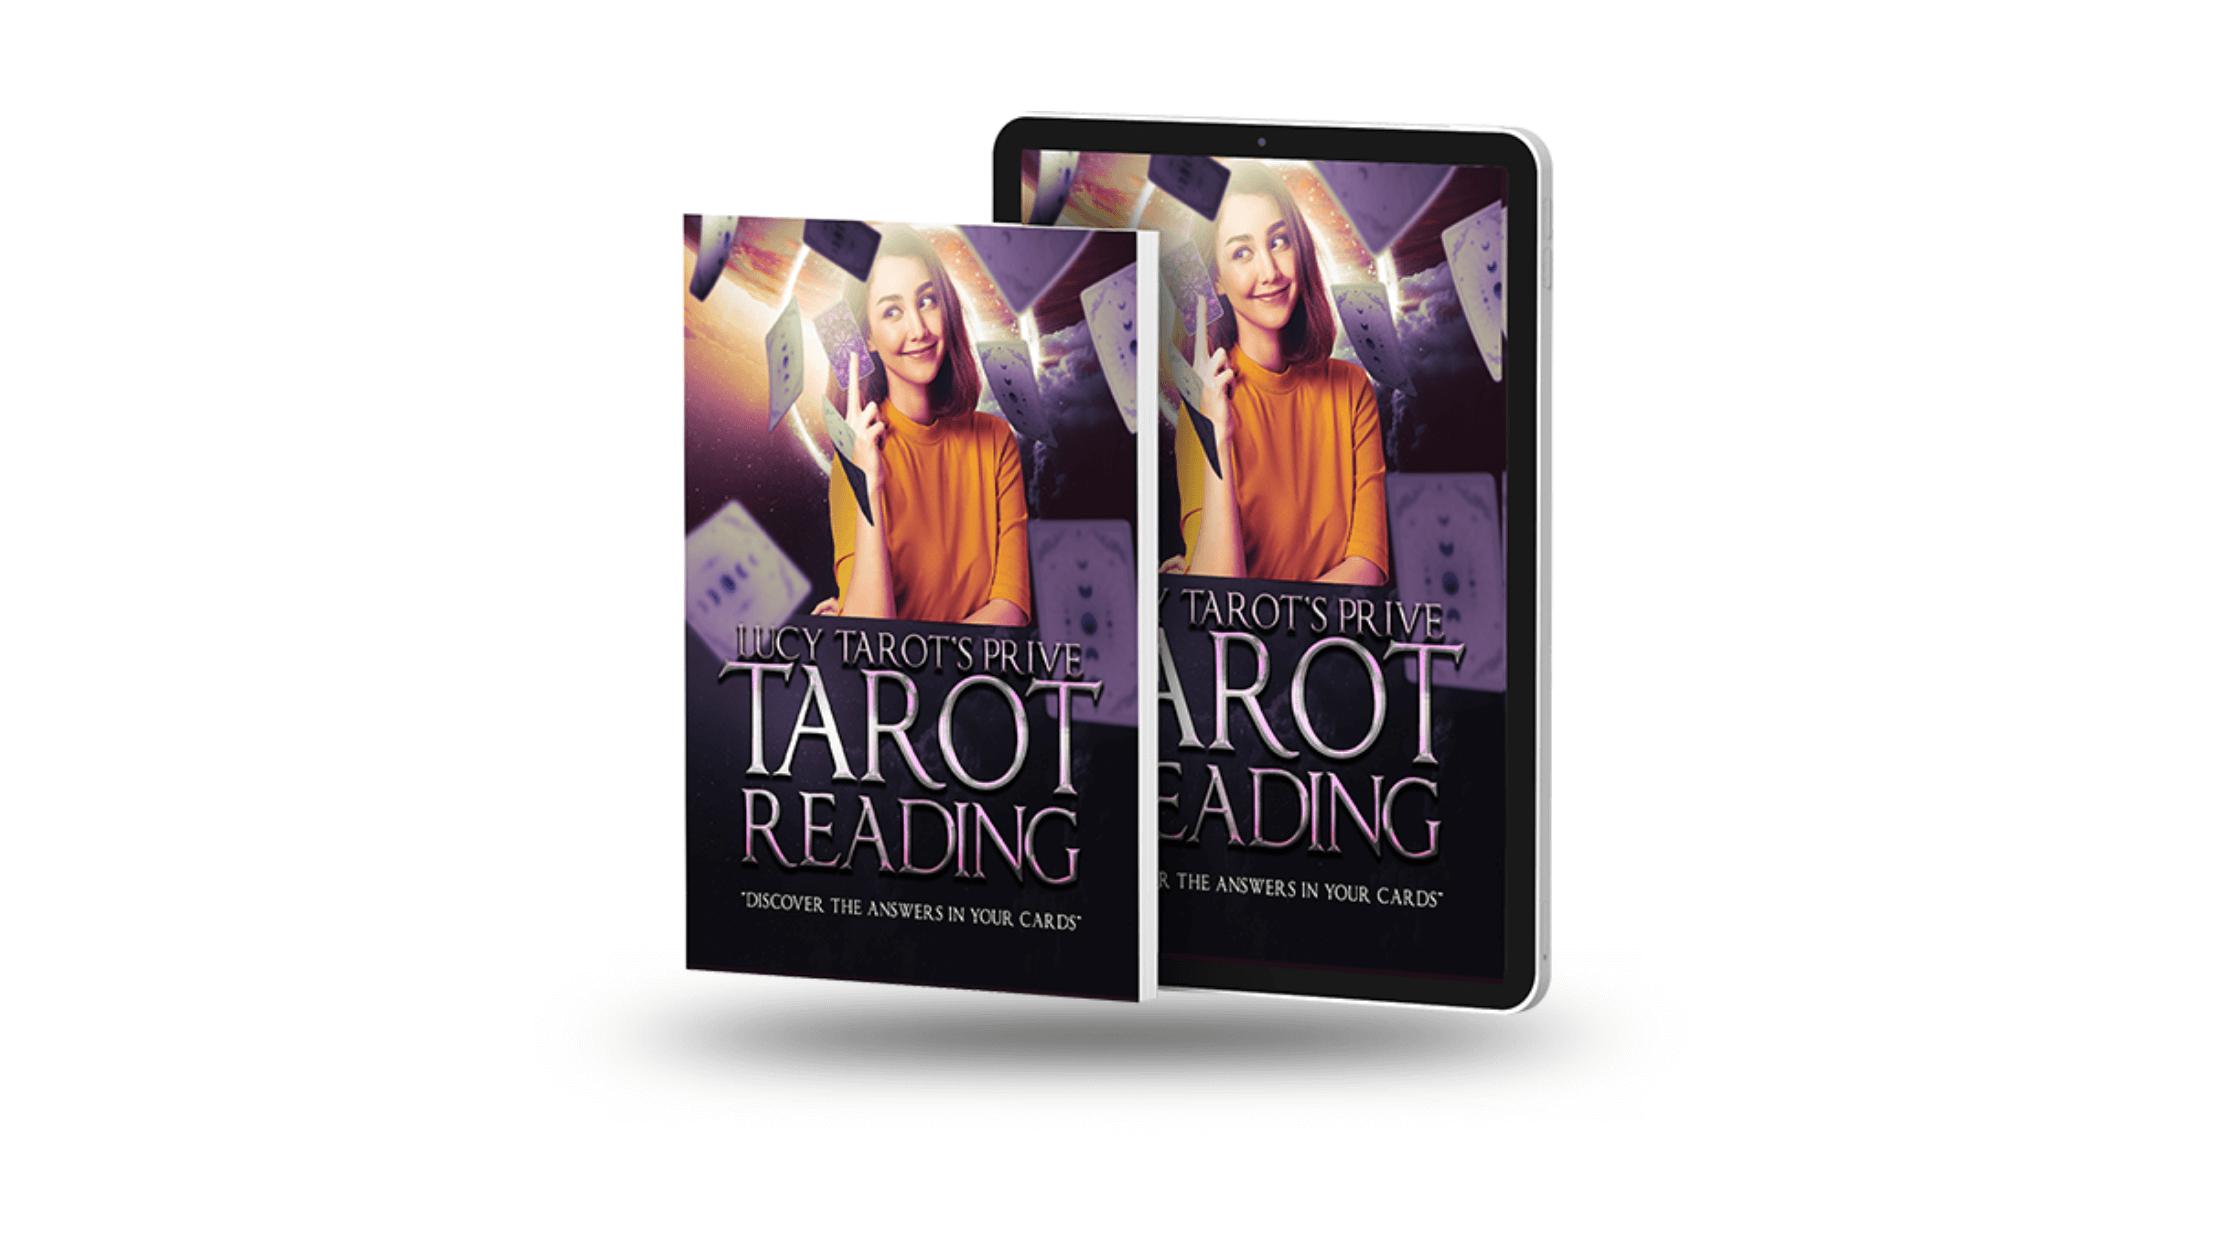 Lucy Tarot Card Reading Reviews